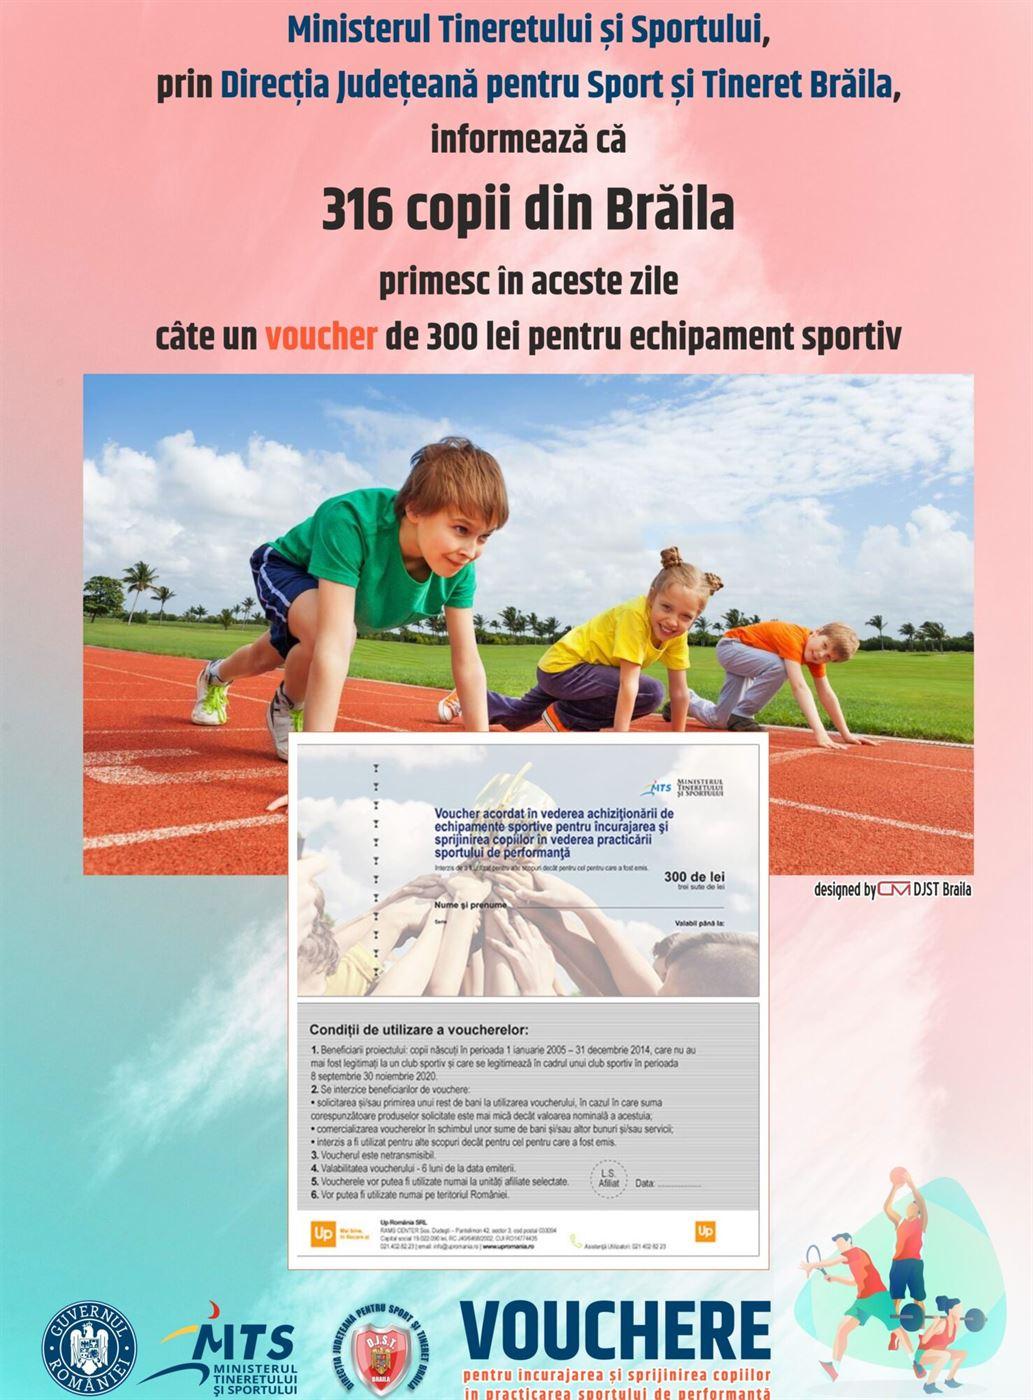 Tichetele voucher sportiv au ajuns la Brăila